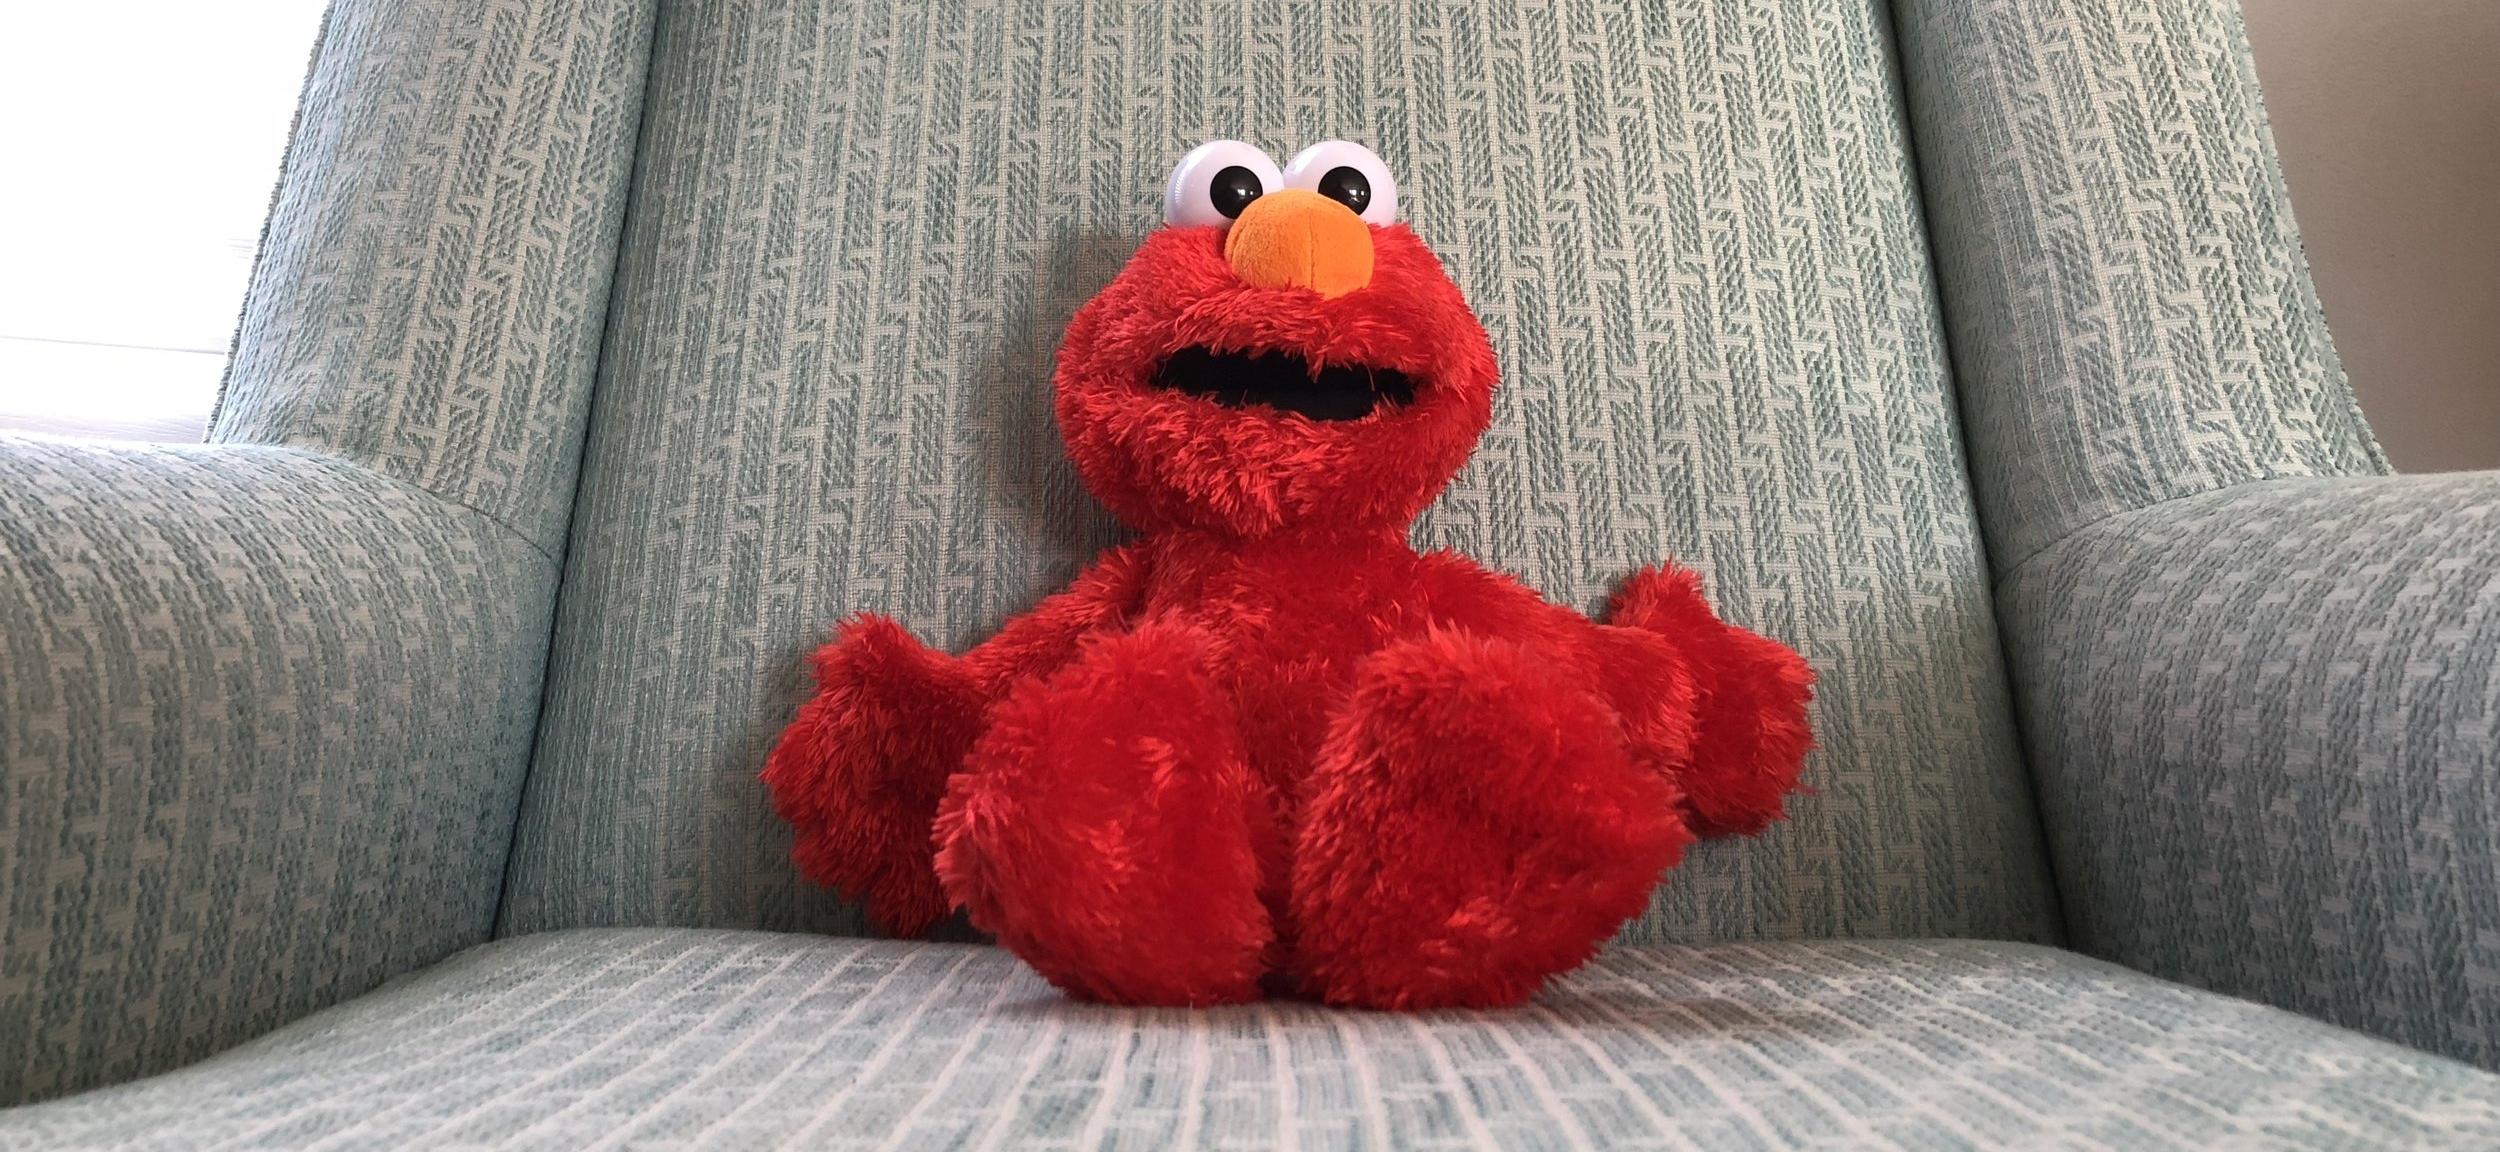 Tickle Me Elmo | The Talking Elmo Doll That Won't Stop